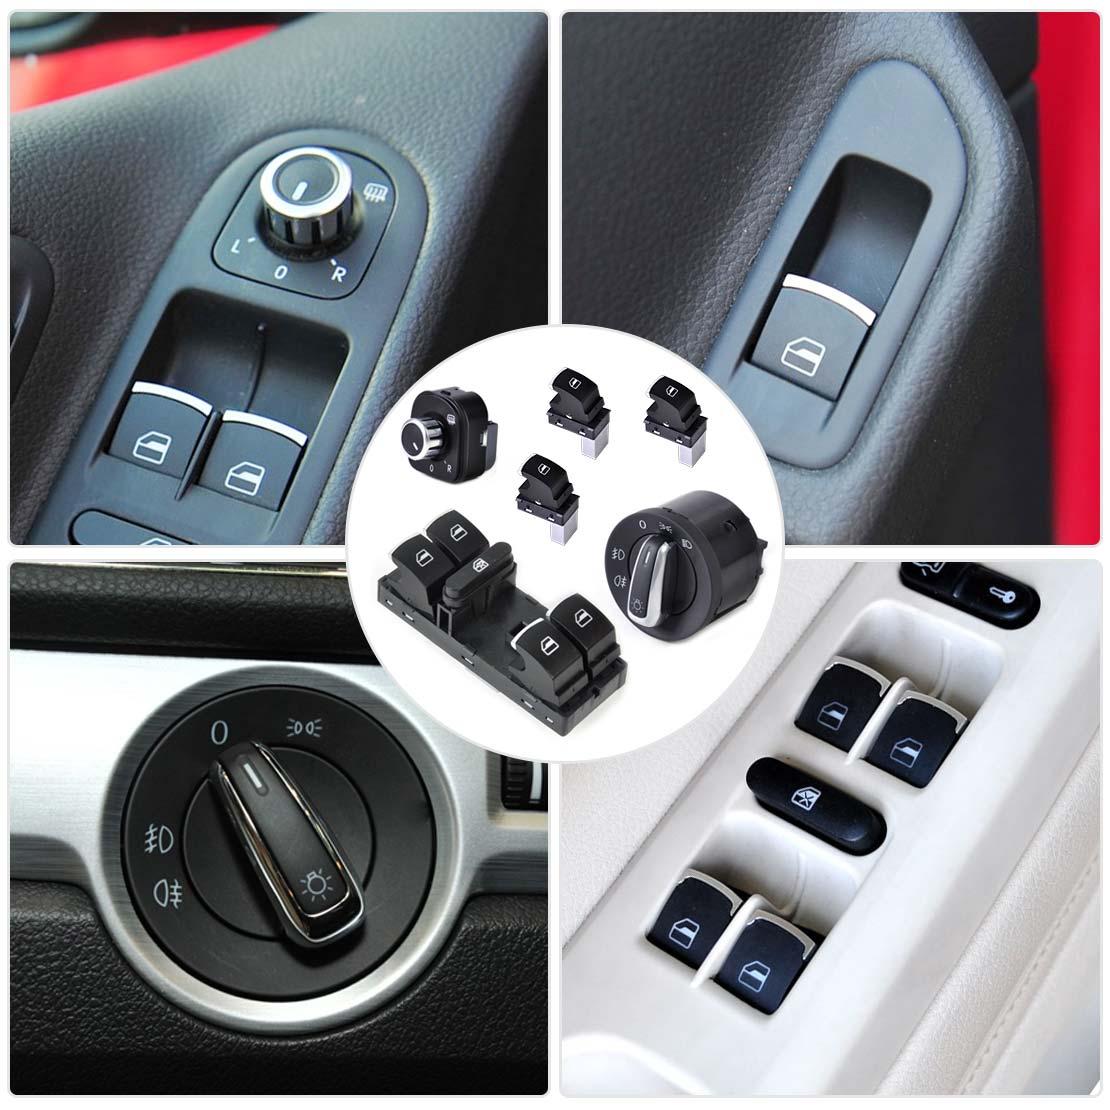 beler Headlight Mirror Window Switch Control Set for VW Golf Jetta GTI MK5 MK6 Passat B6 3C Rabbit Tiguan 5ND941431A 5ND959565B headlight mirror window switch passat b6 3c - title=